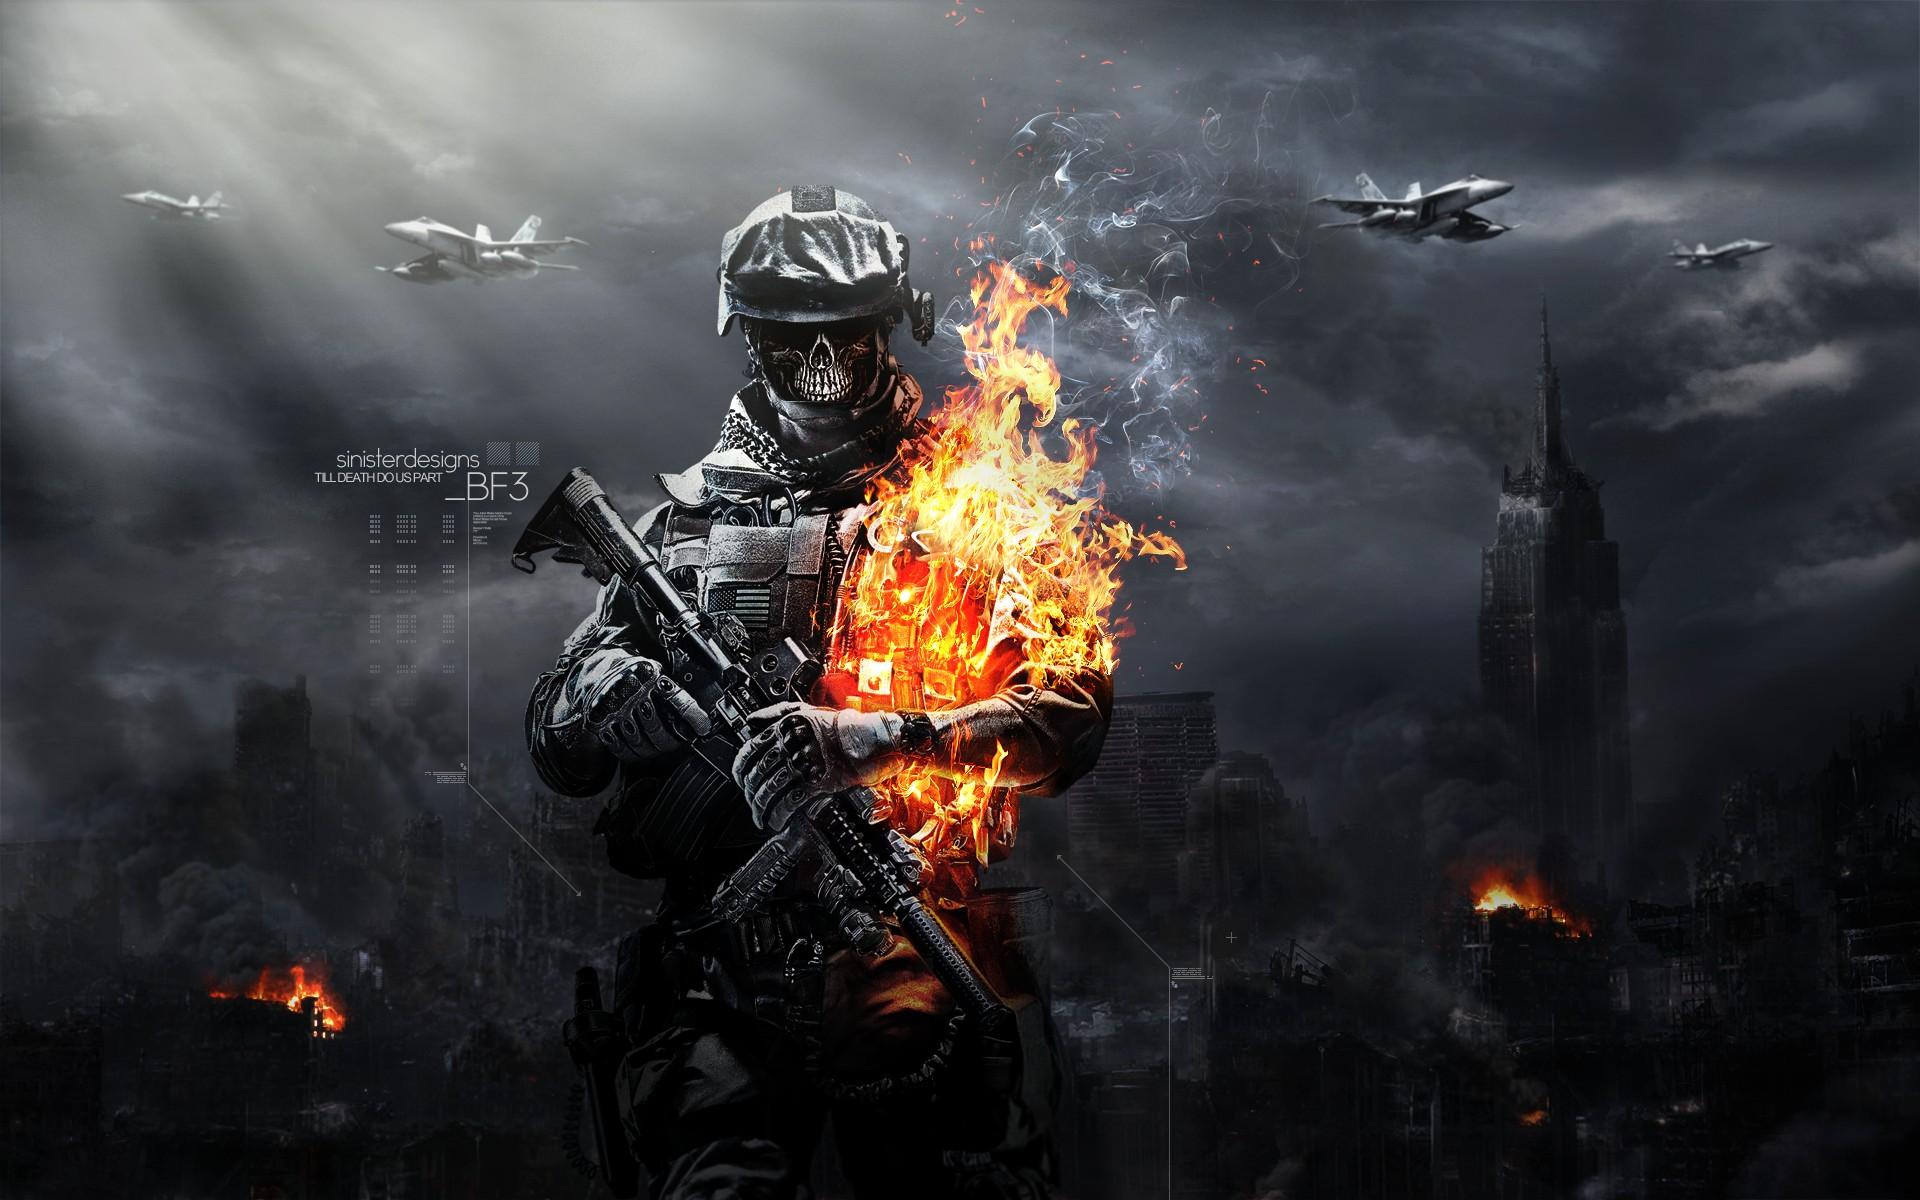 Battlefield 3 Zombie Mode Wallpapers HD Wallpapers 1920x1200